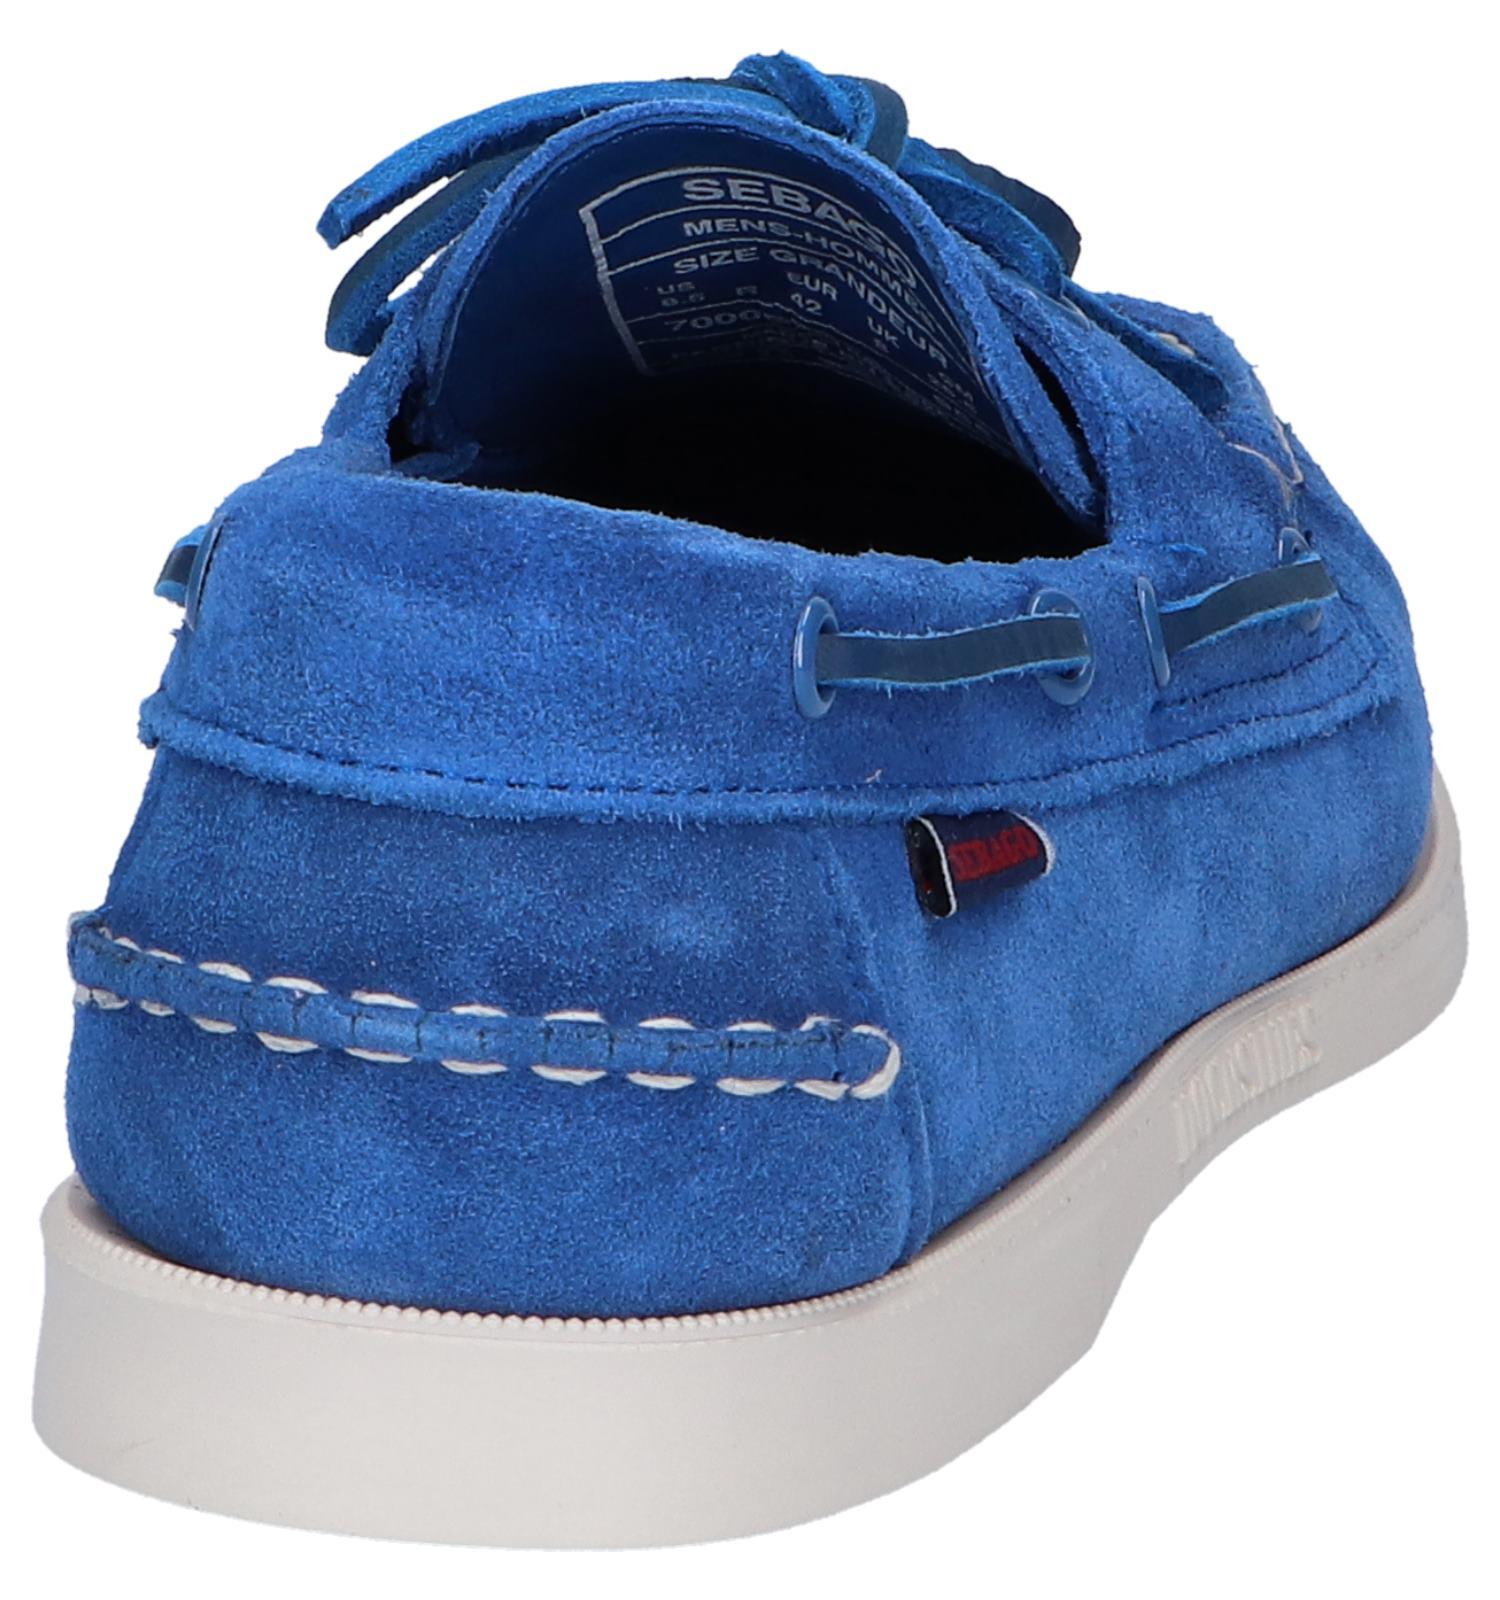 Bootschoenen Blauwe Bootschoenen Blauwe Dockside Dockside Bootschoenen Sebago Sebago Blauwe 7yfgb6